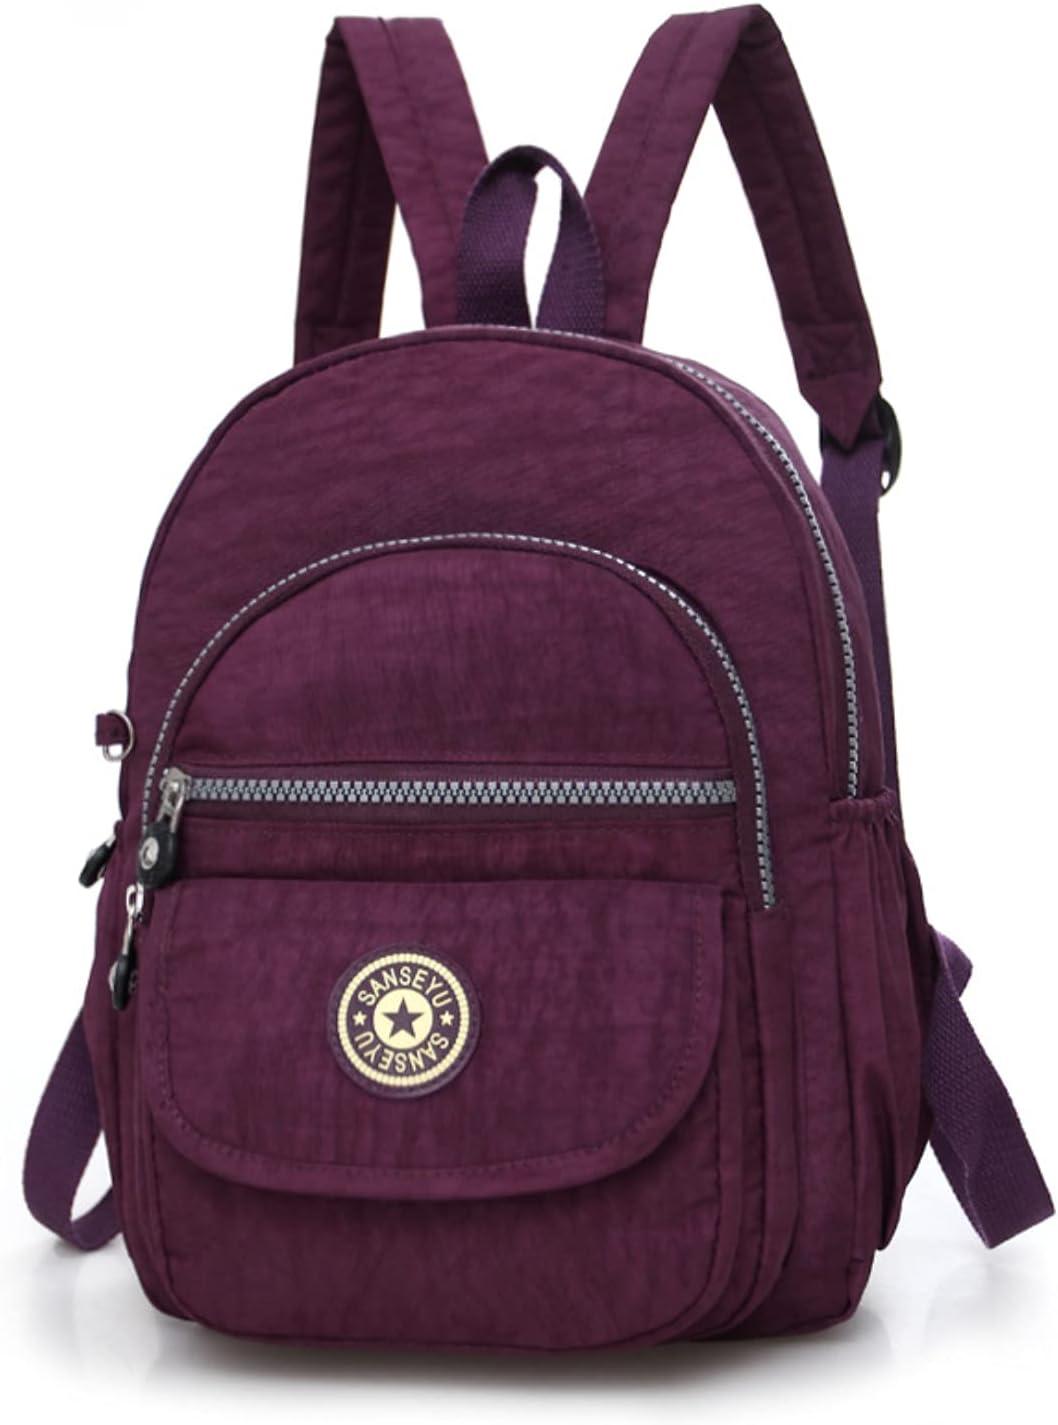 Small Travel Bag Waterproof Mini Backpack Women Purse Nylon Shoulder Rucksack (Dark Purple)